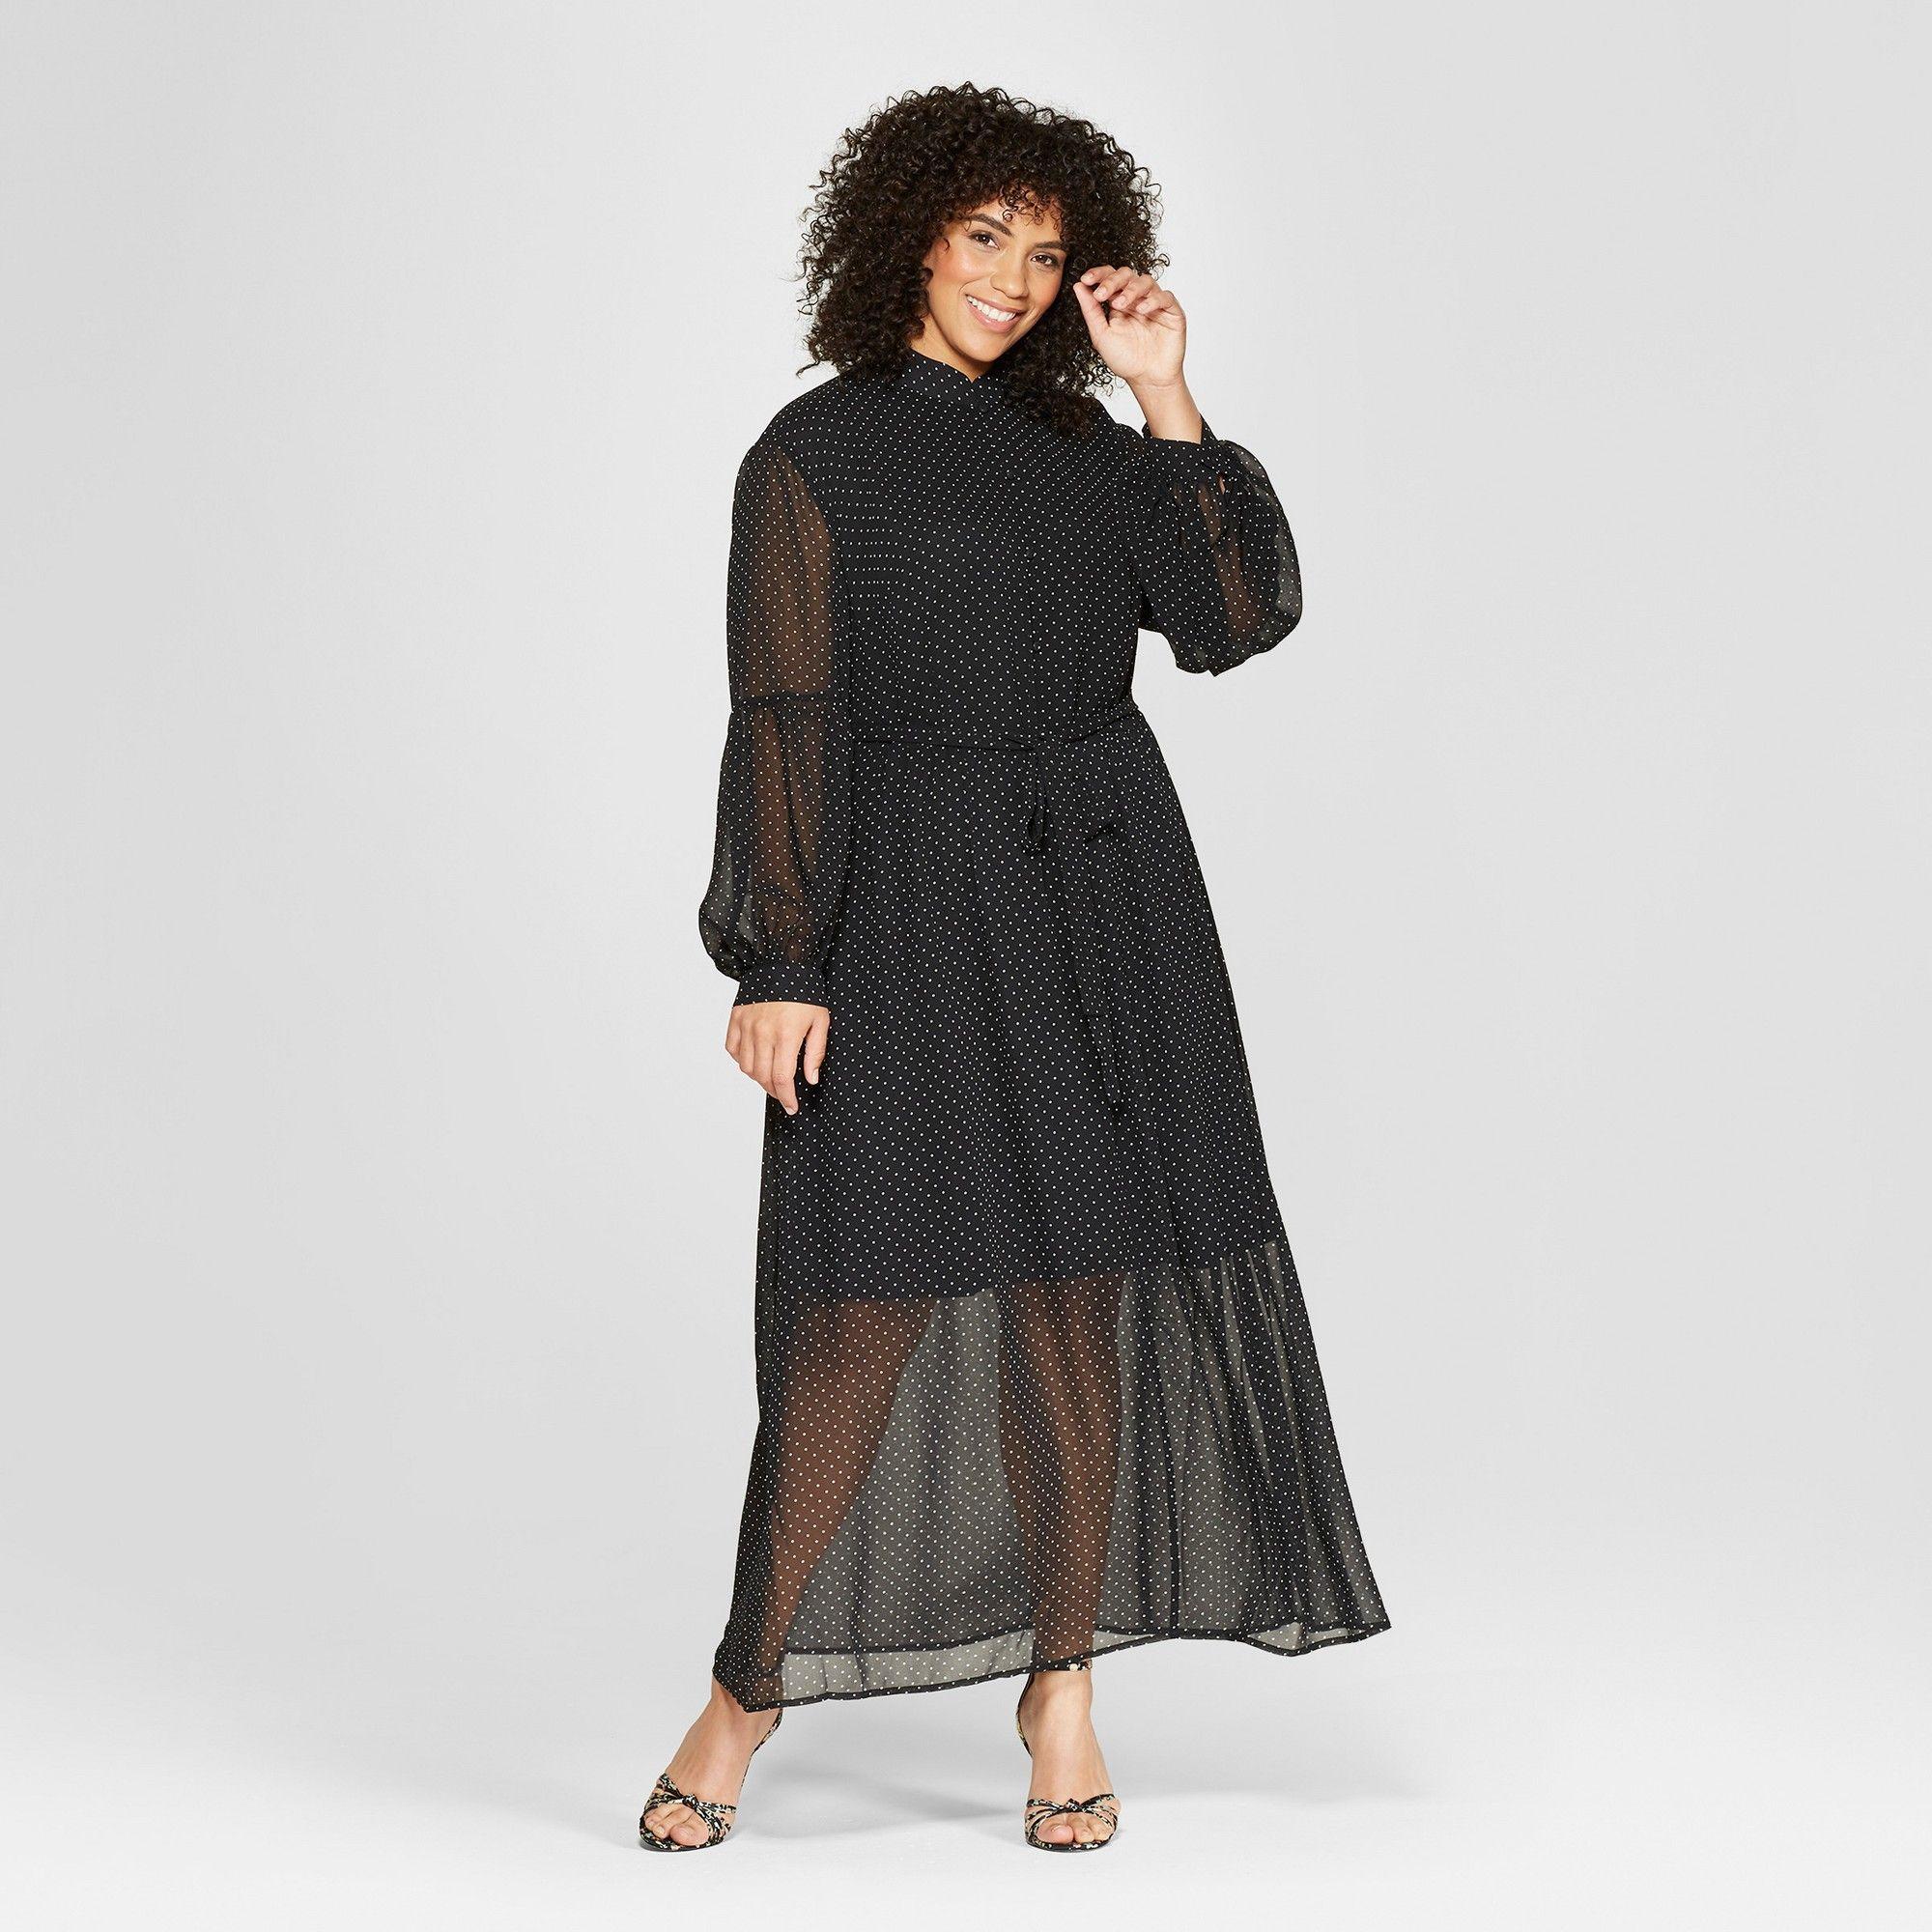 567ca6bdb12 Women s Plus Size Polka Dot Long Sleeve Belted Maxi Dress - Who What Wear  Black White 2X